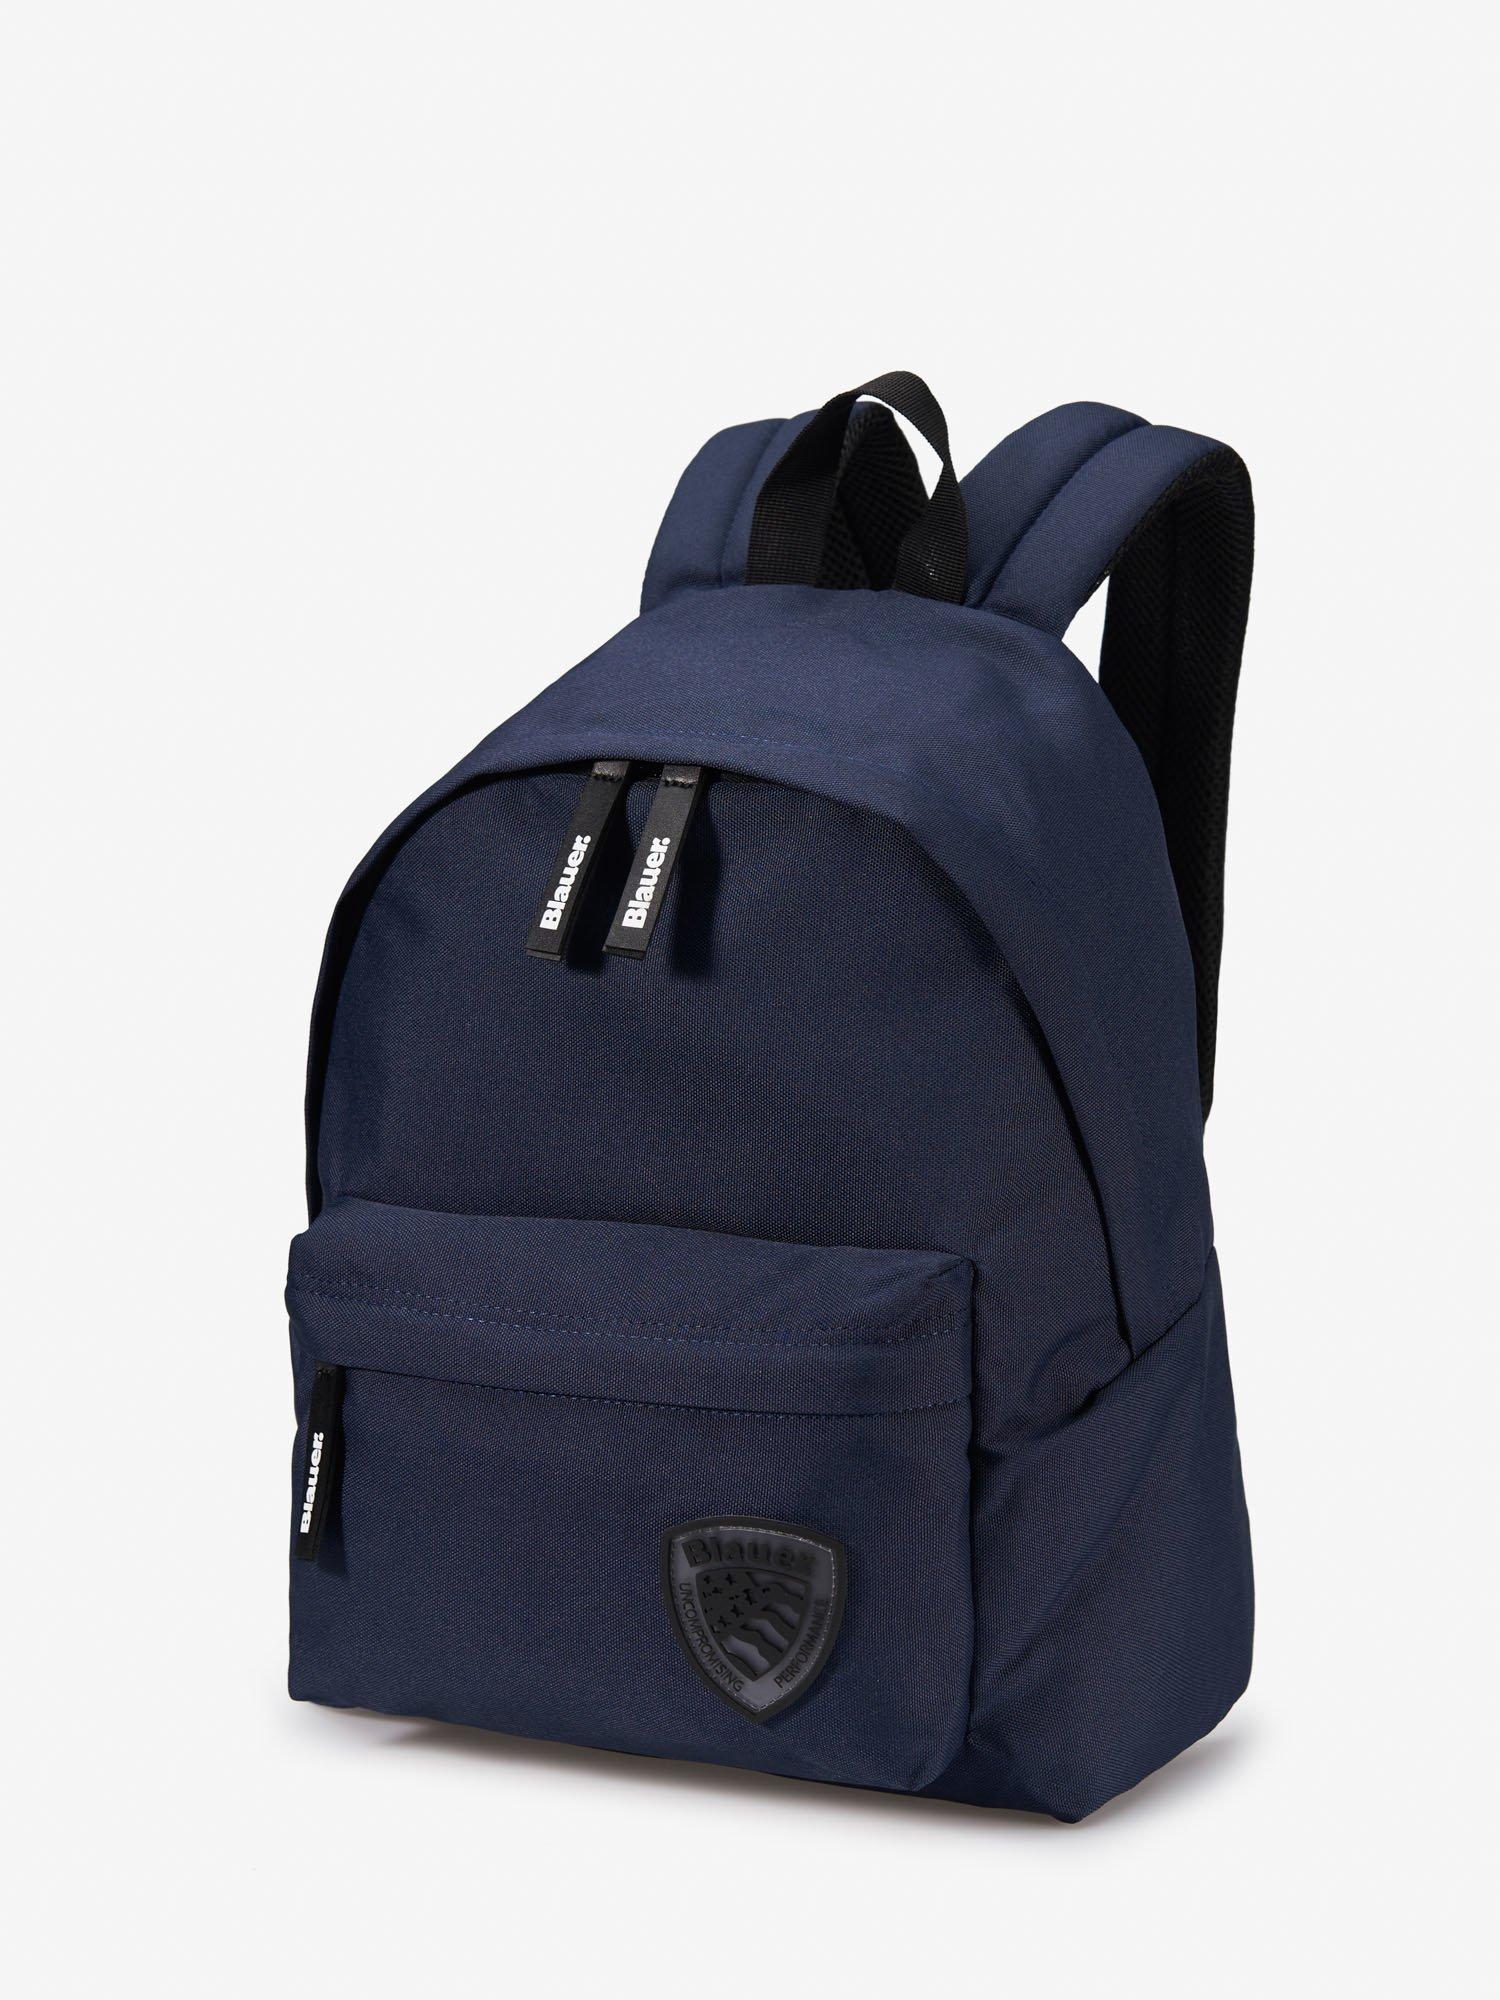 27ed328372 Zaini e Borse da Uomo firmate Blauer - Shop Online | Blauer USA ®